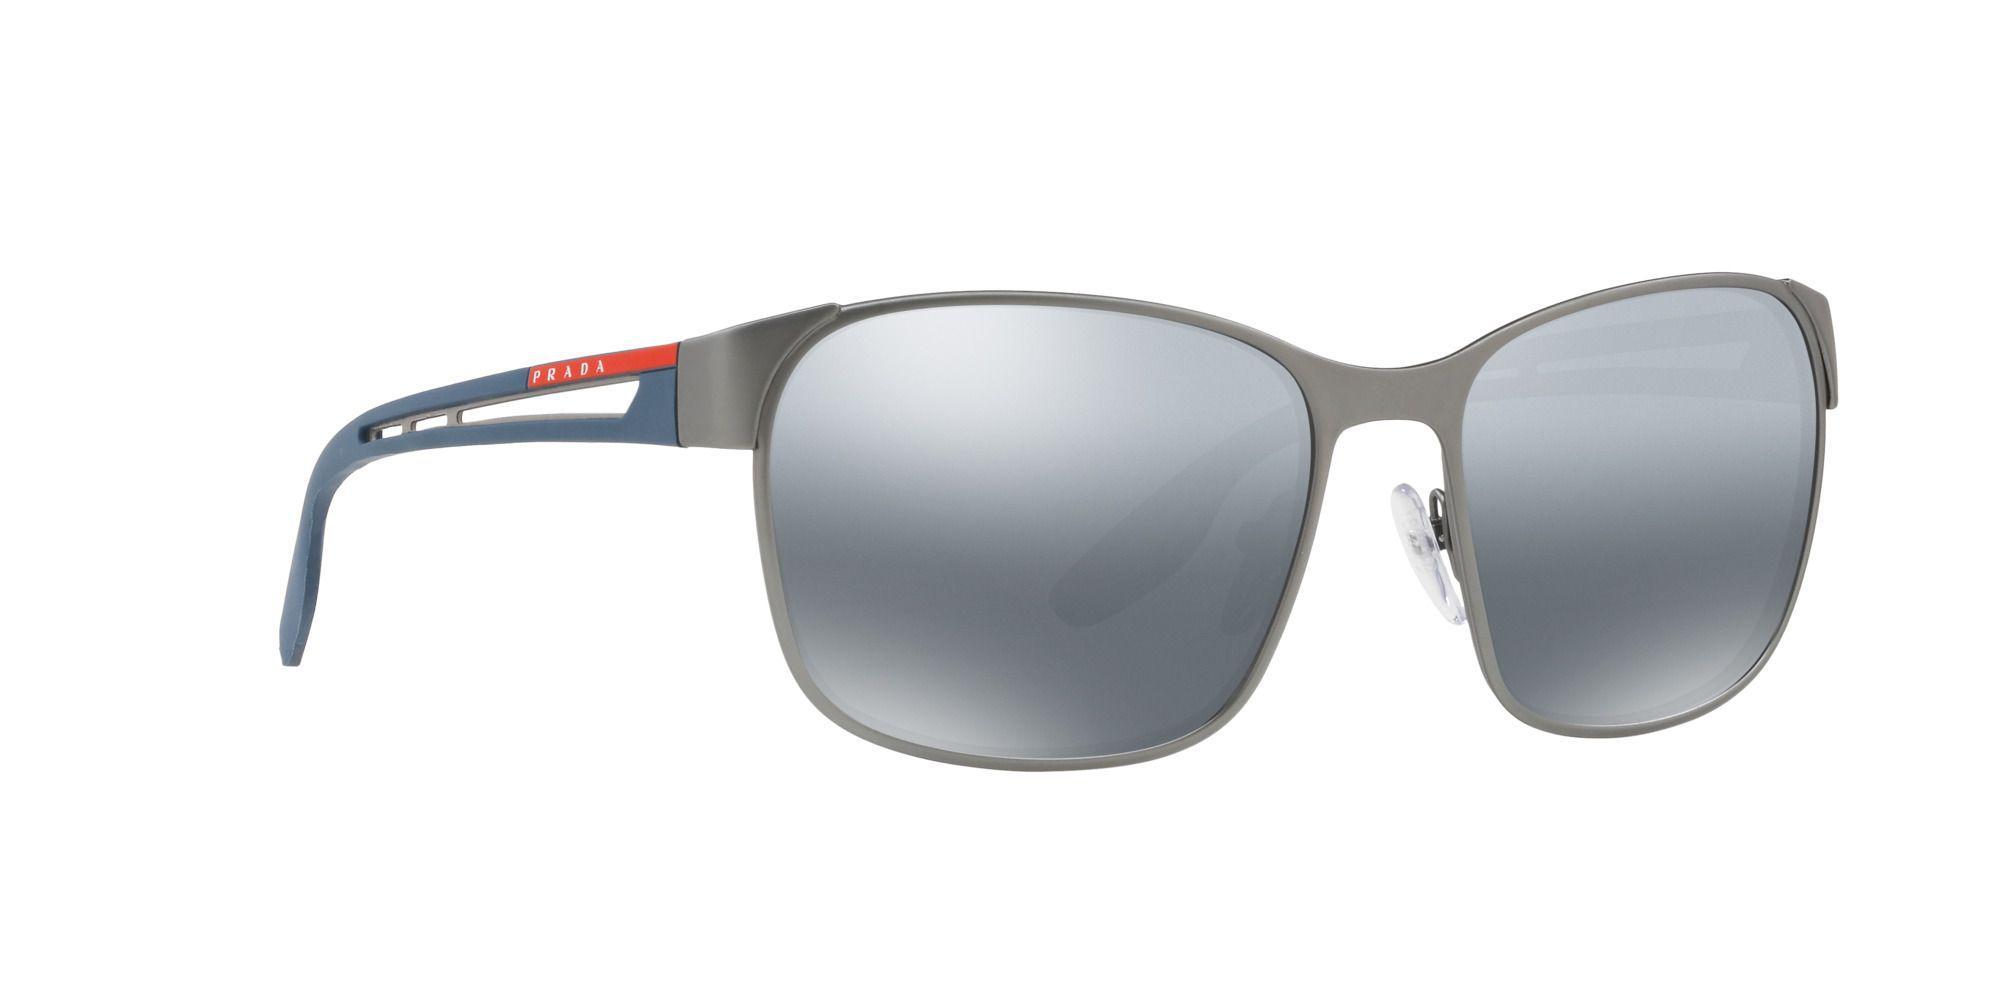 a8dca79be8 Prada - Gray Gunmetal Ps 52ts Pillow Sunglasses for Men - Lyst. View  fullscreen